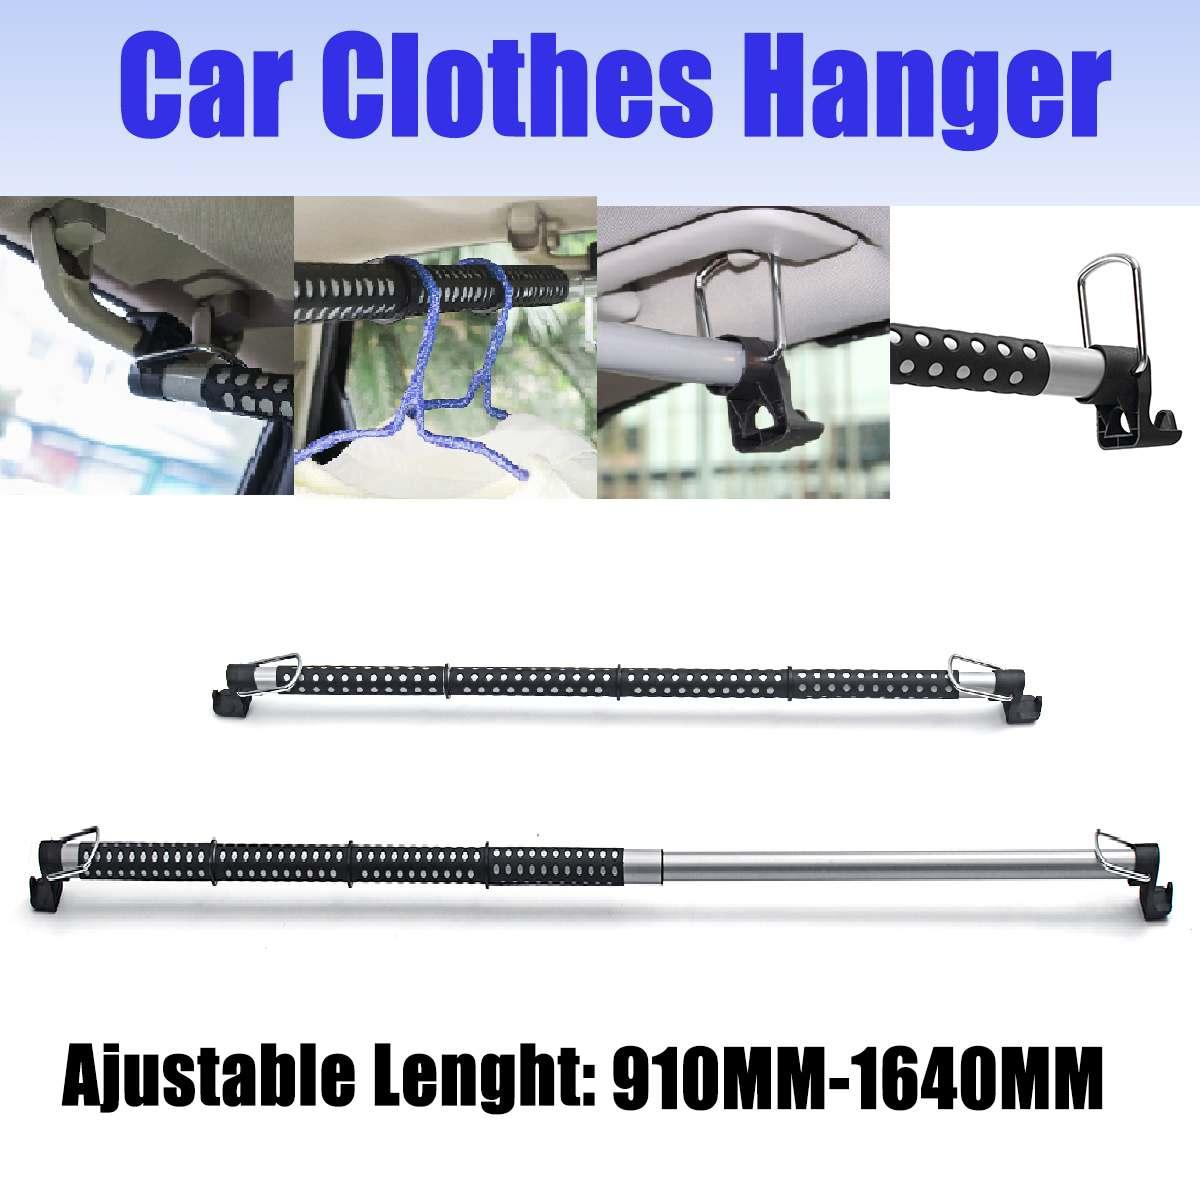 Percha de coche longitud ajustable Universal extendida Auto percha de ropa para coche Barra para ropa Bar Perchero de ropa